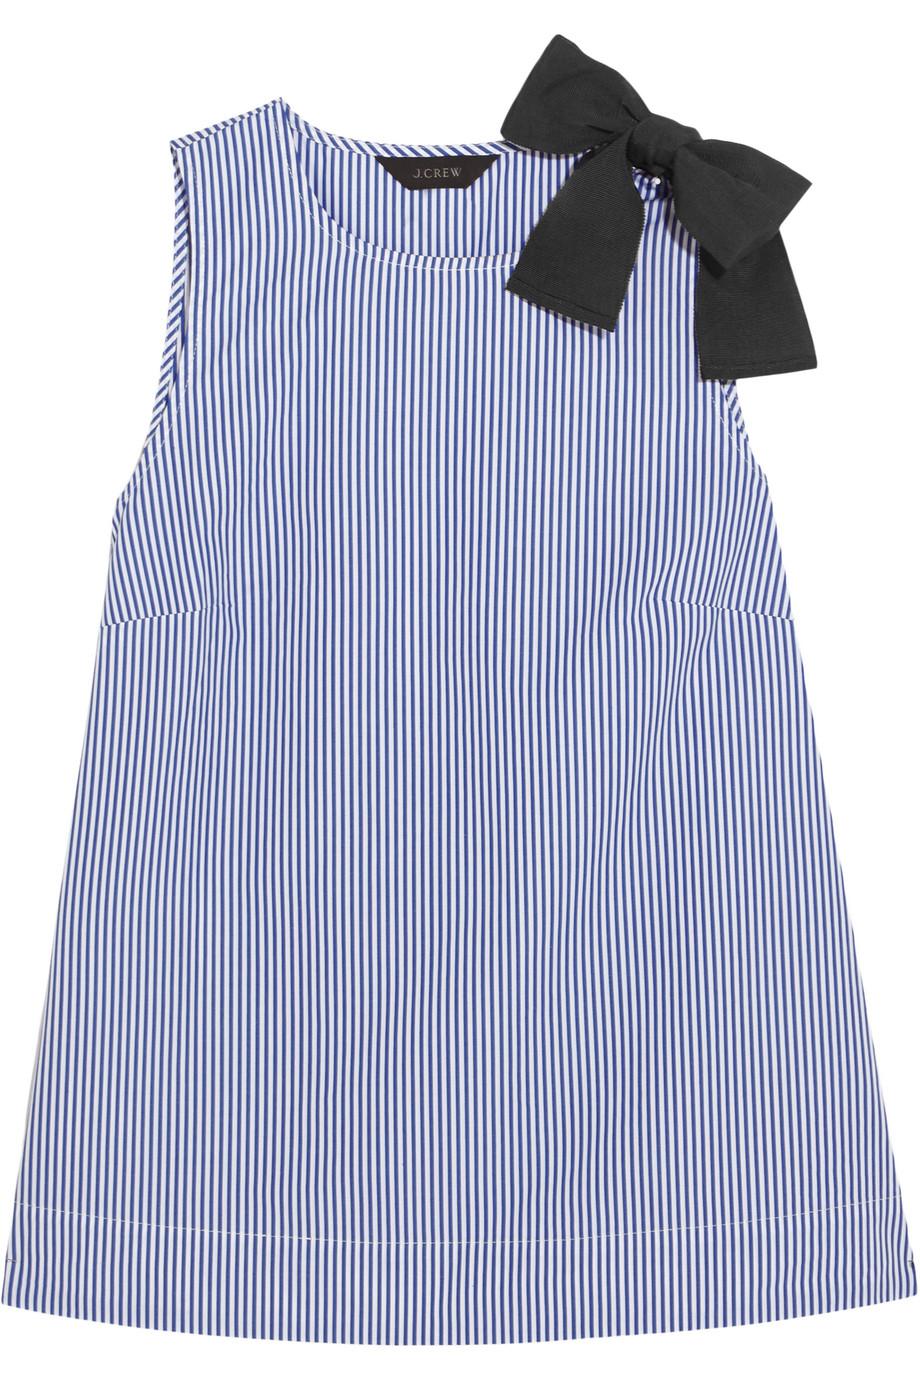 J.Crew Bow-Embellished Striped Cotton-Poplin Top, Blue, Women's, Size: 4